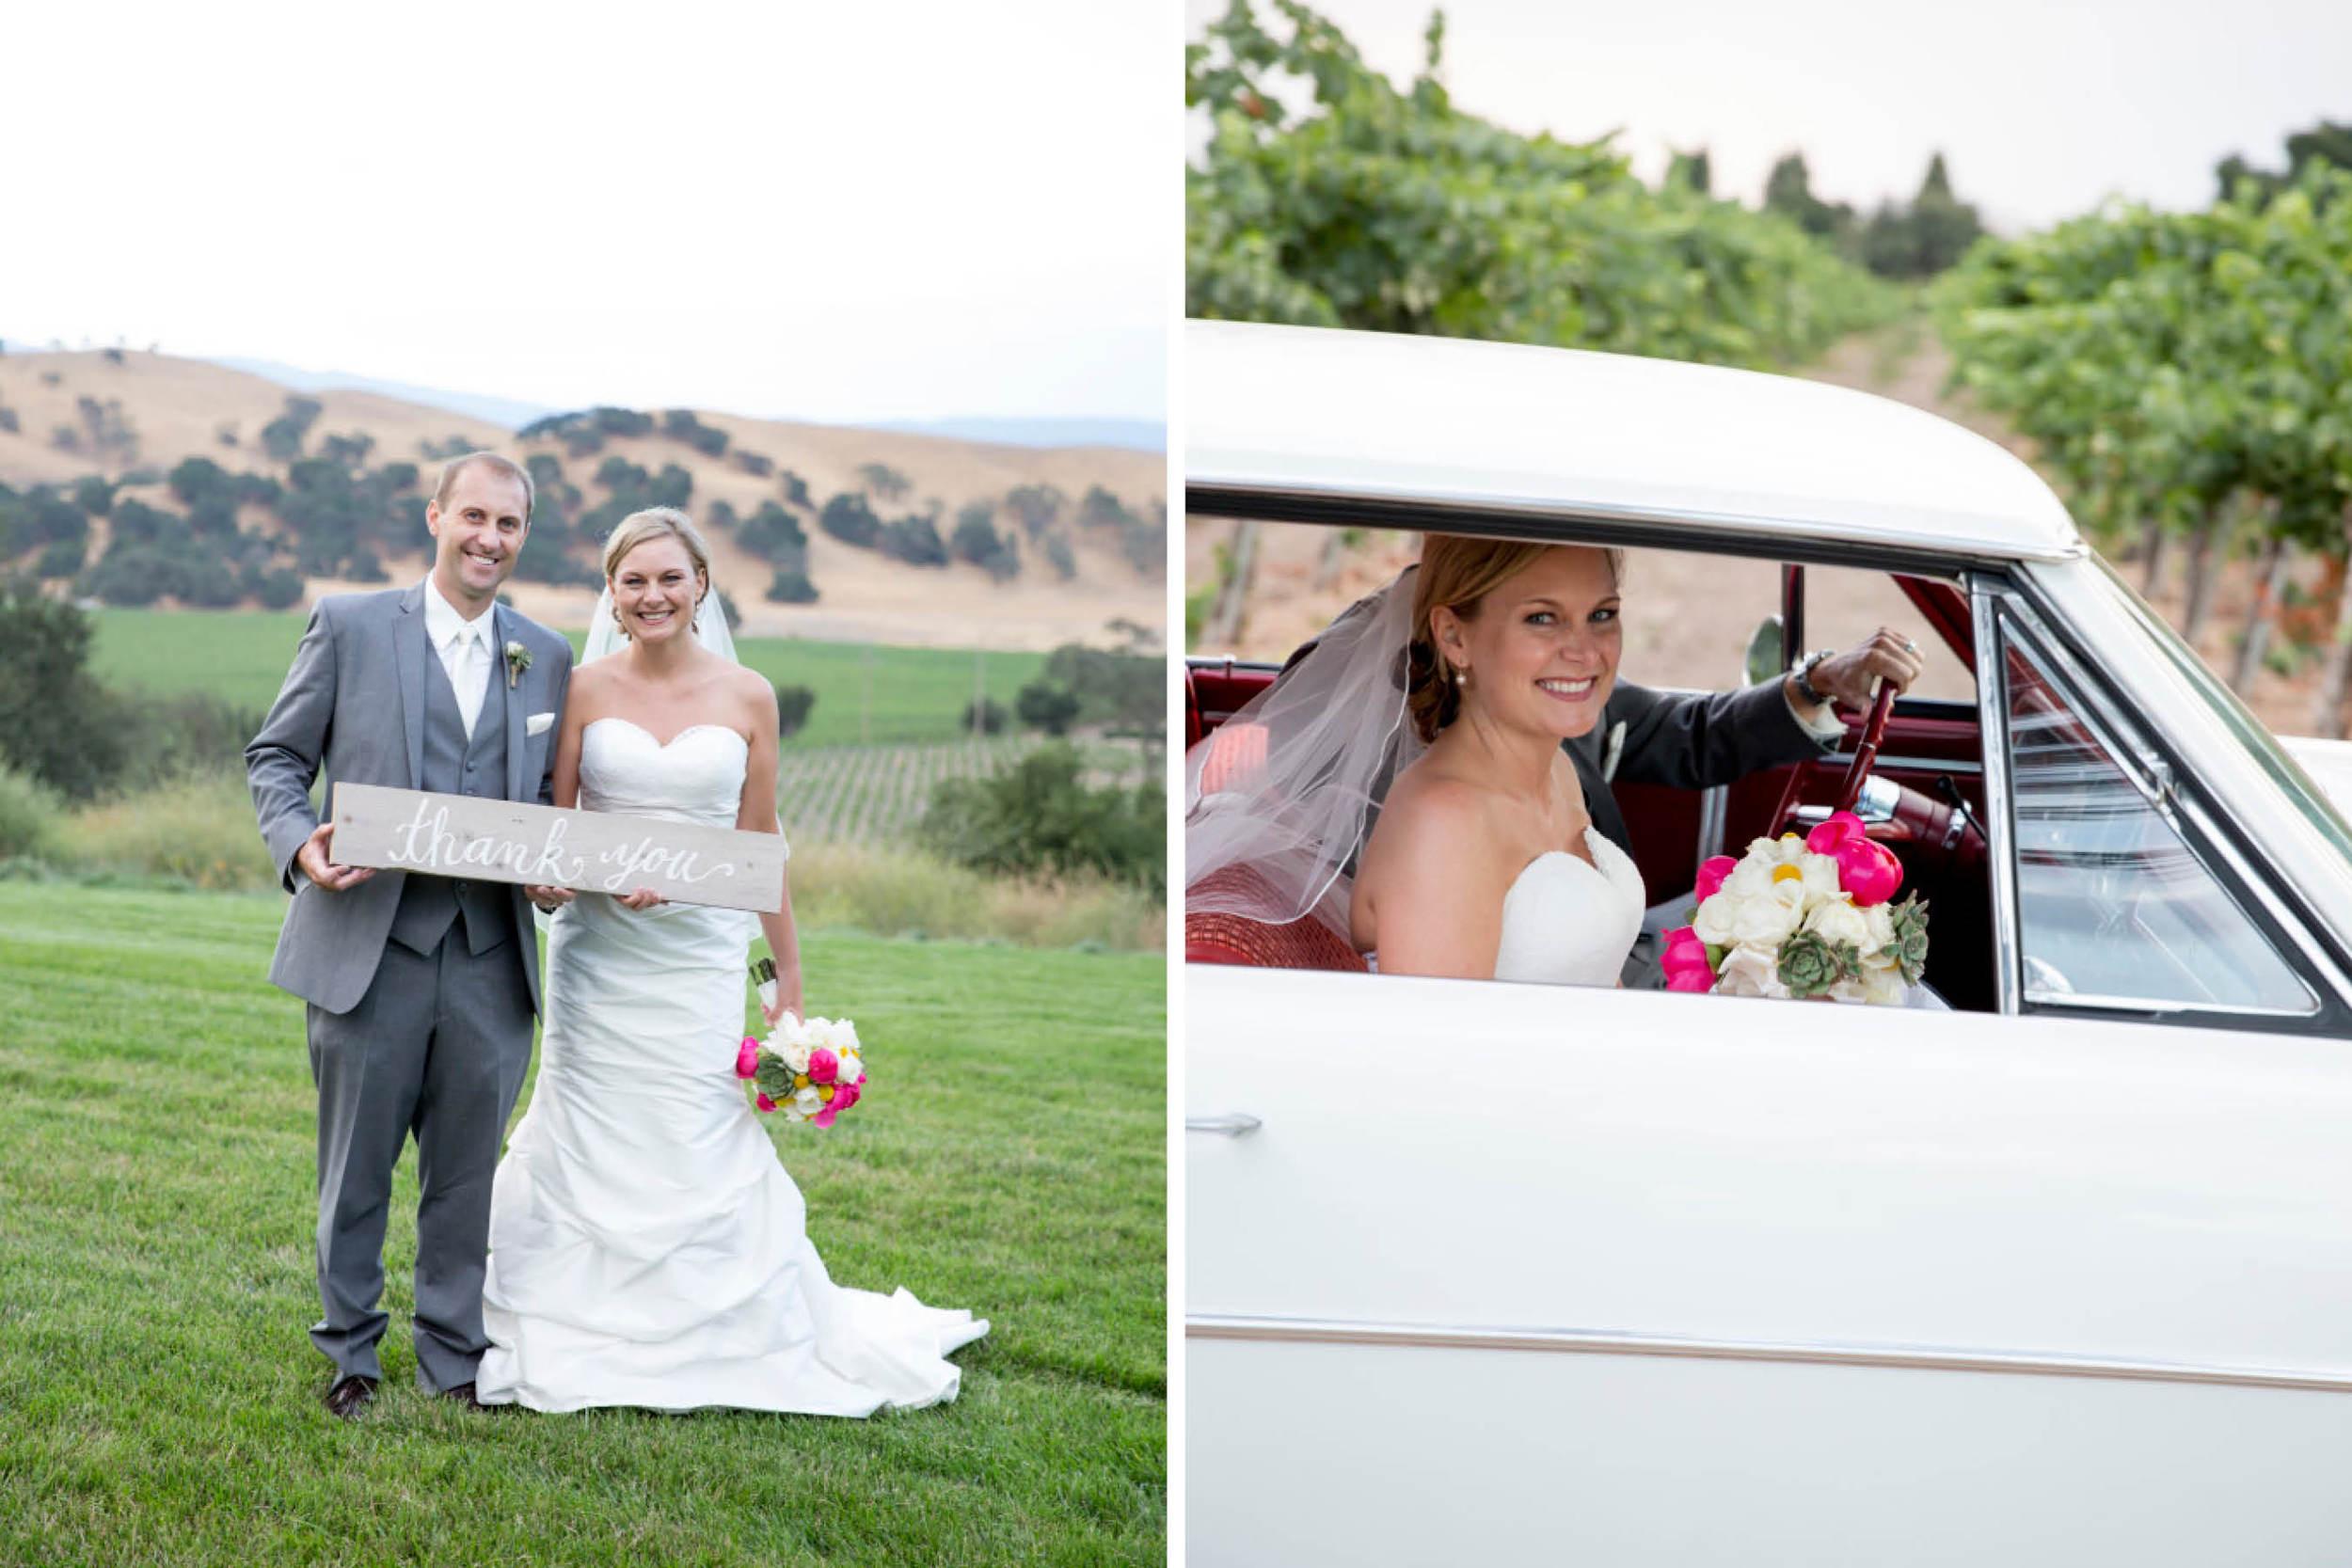 firestone-winery-vineyard-wedding-planner-coordinator-santa-barbara-ynez-los-olivos (30).jpg